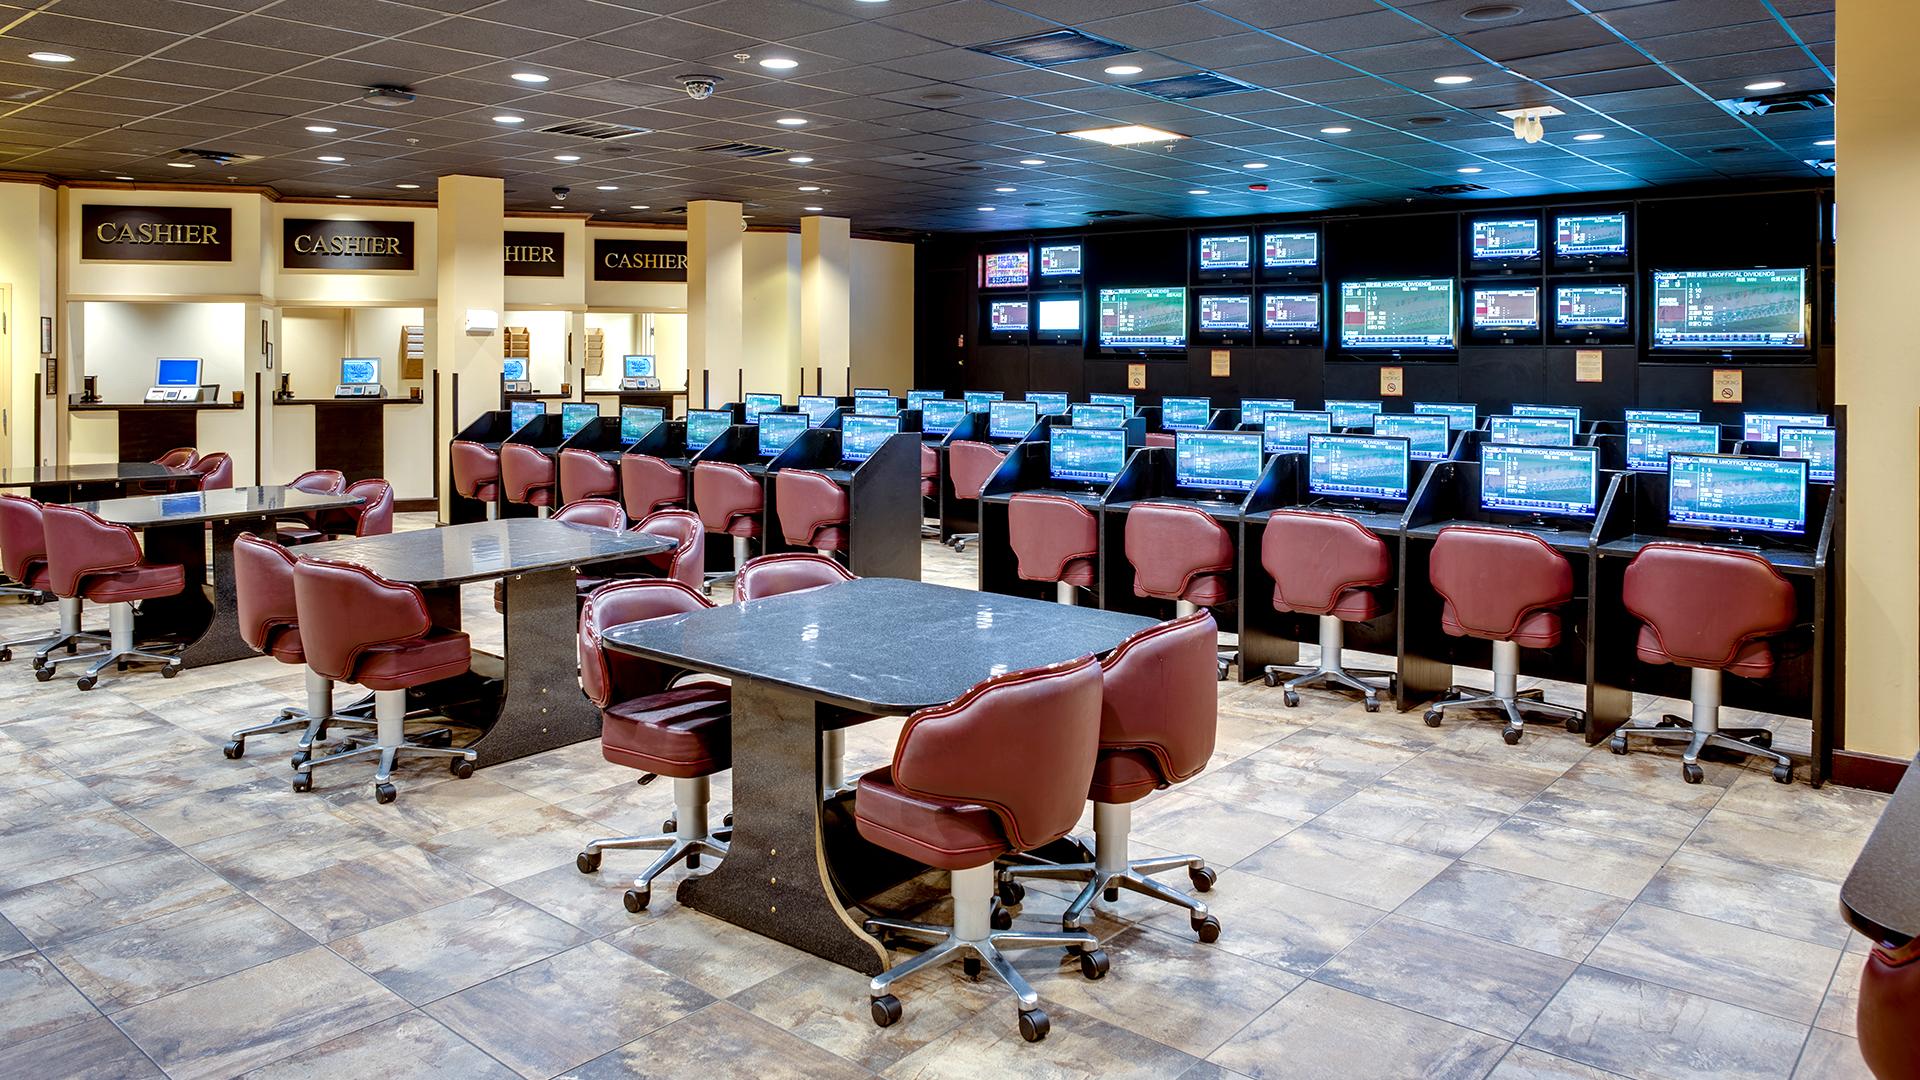 Sports betting winstar casino maxine waters on bet show